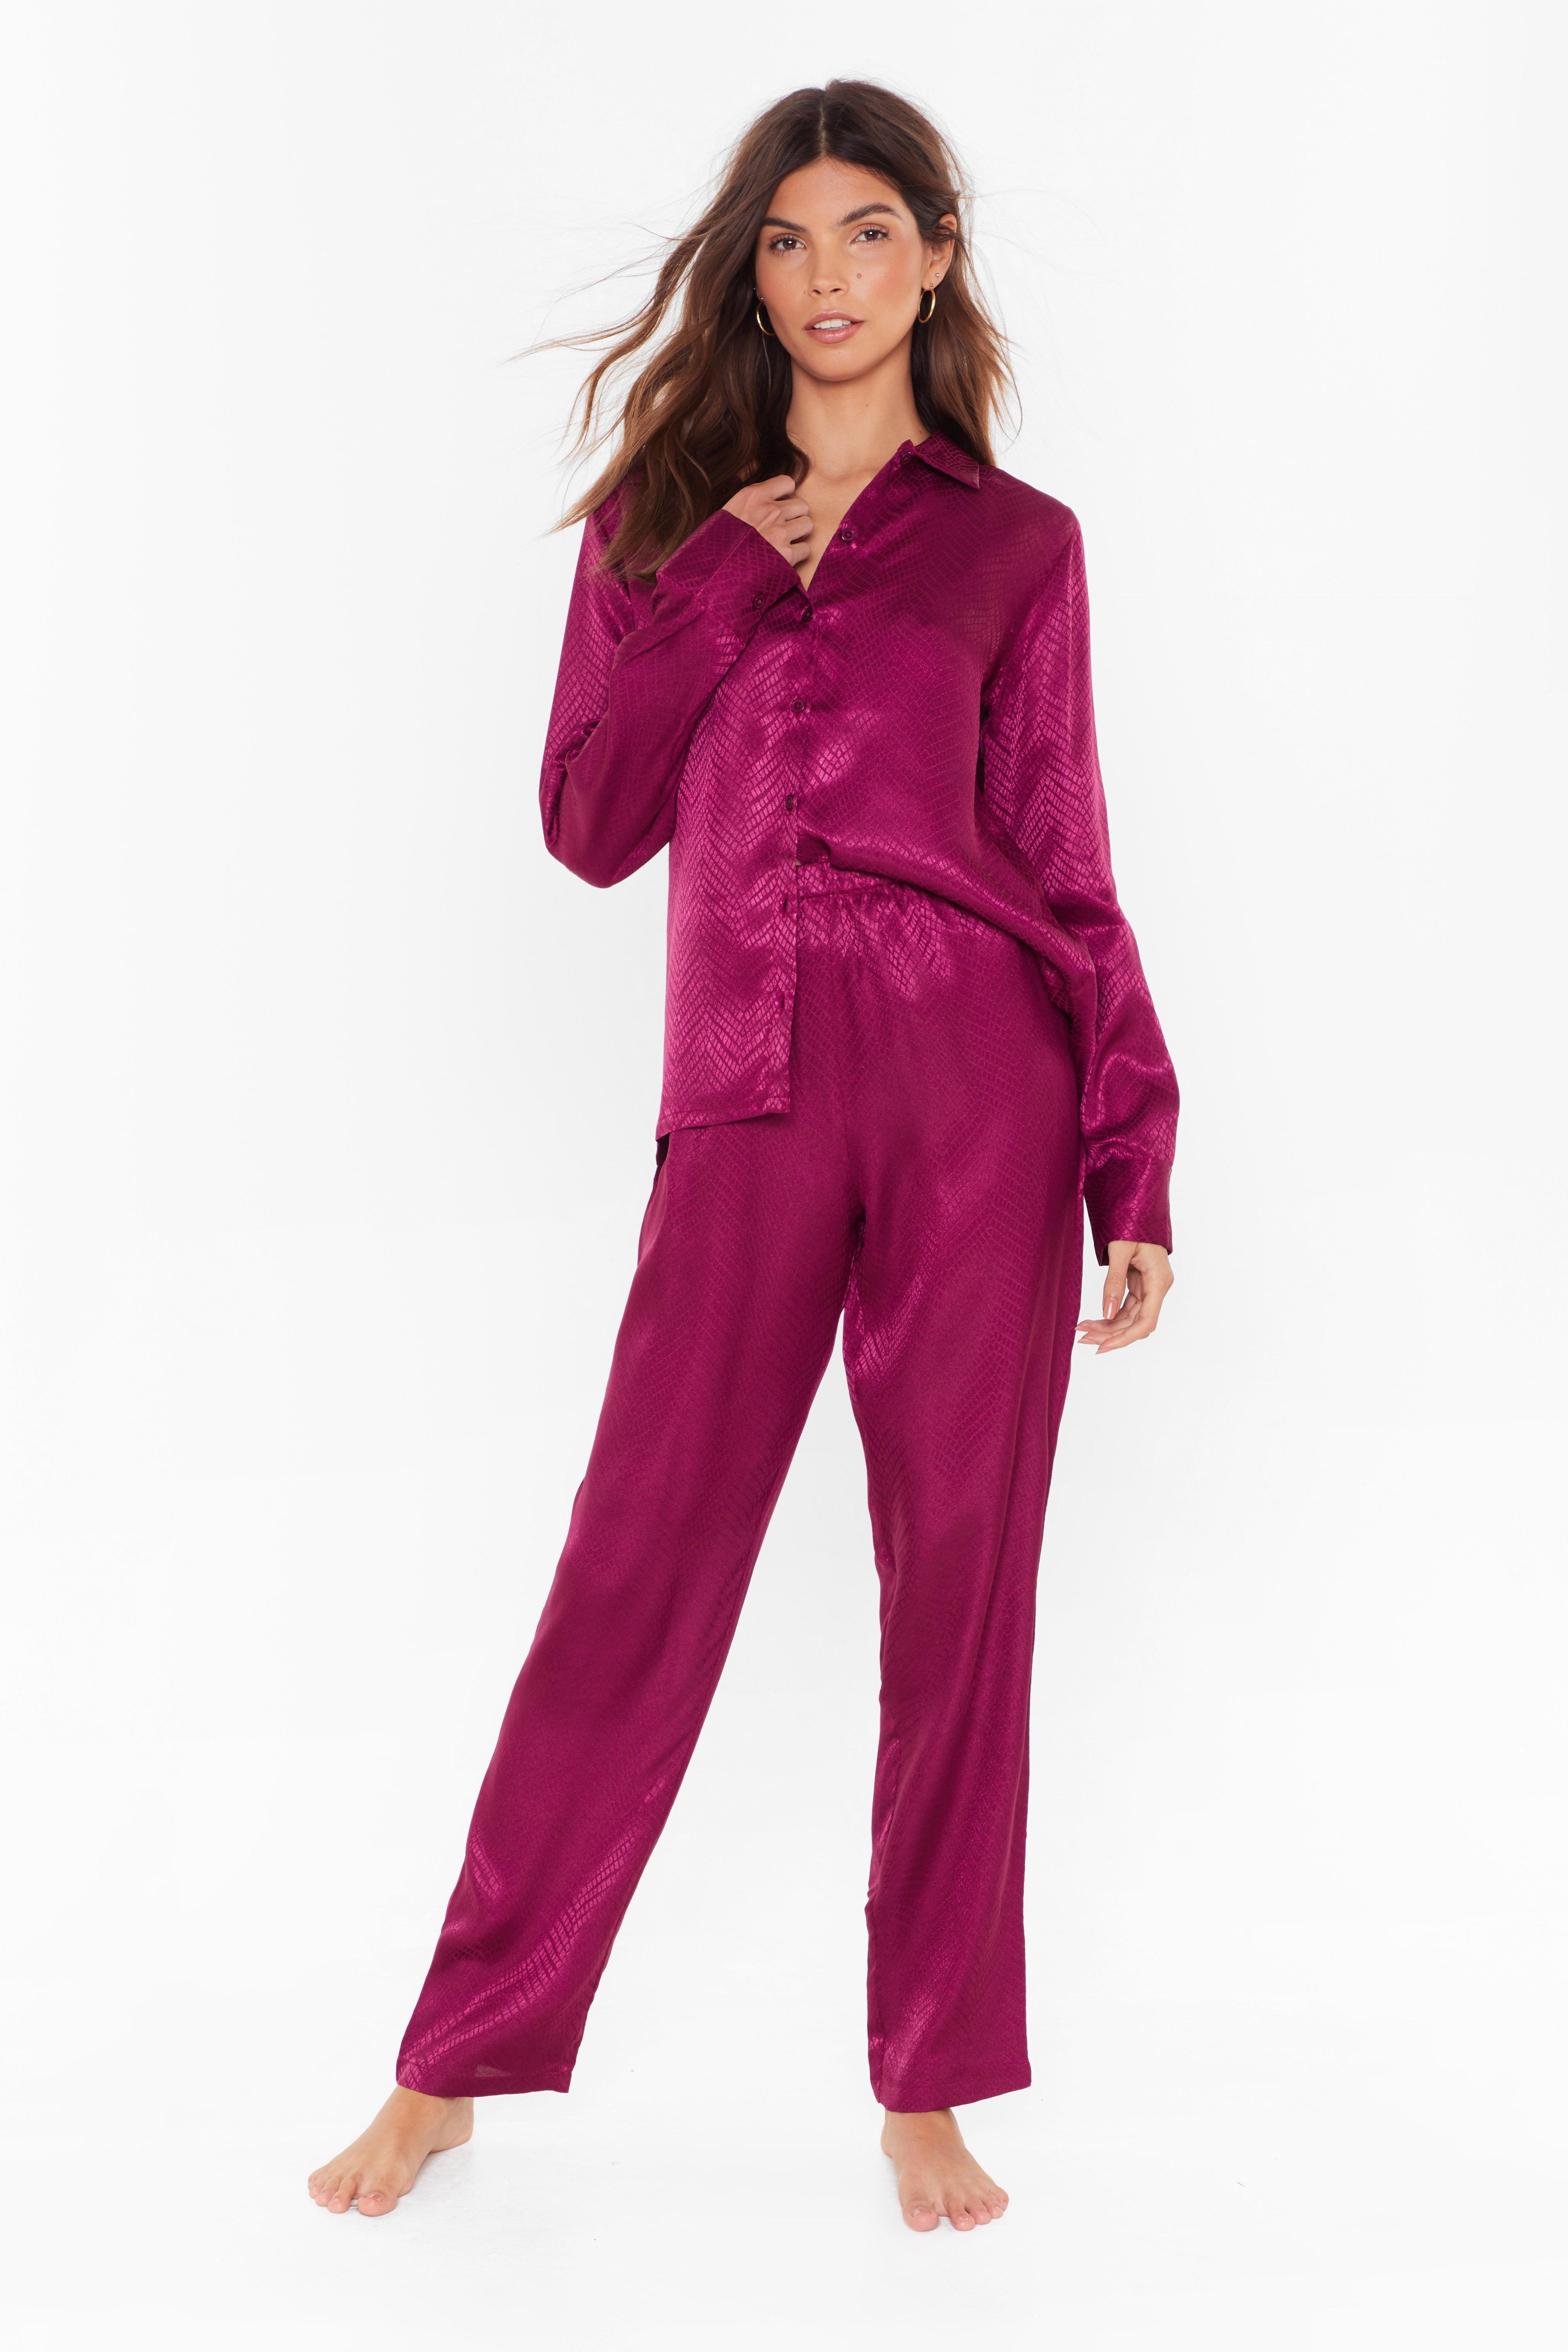 Image of Not Sleeking Alone Satin Pajama Pants Set